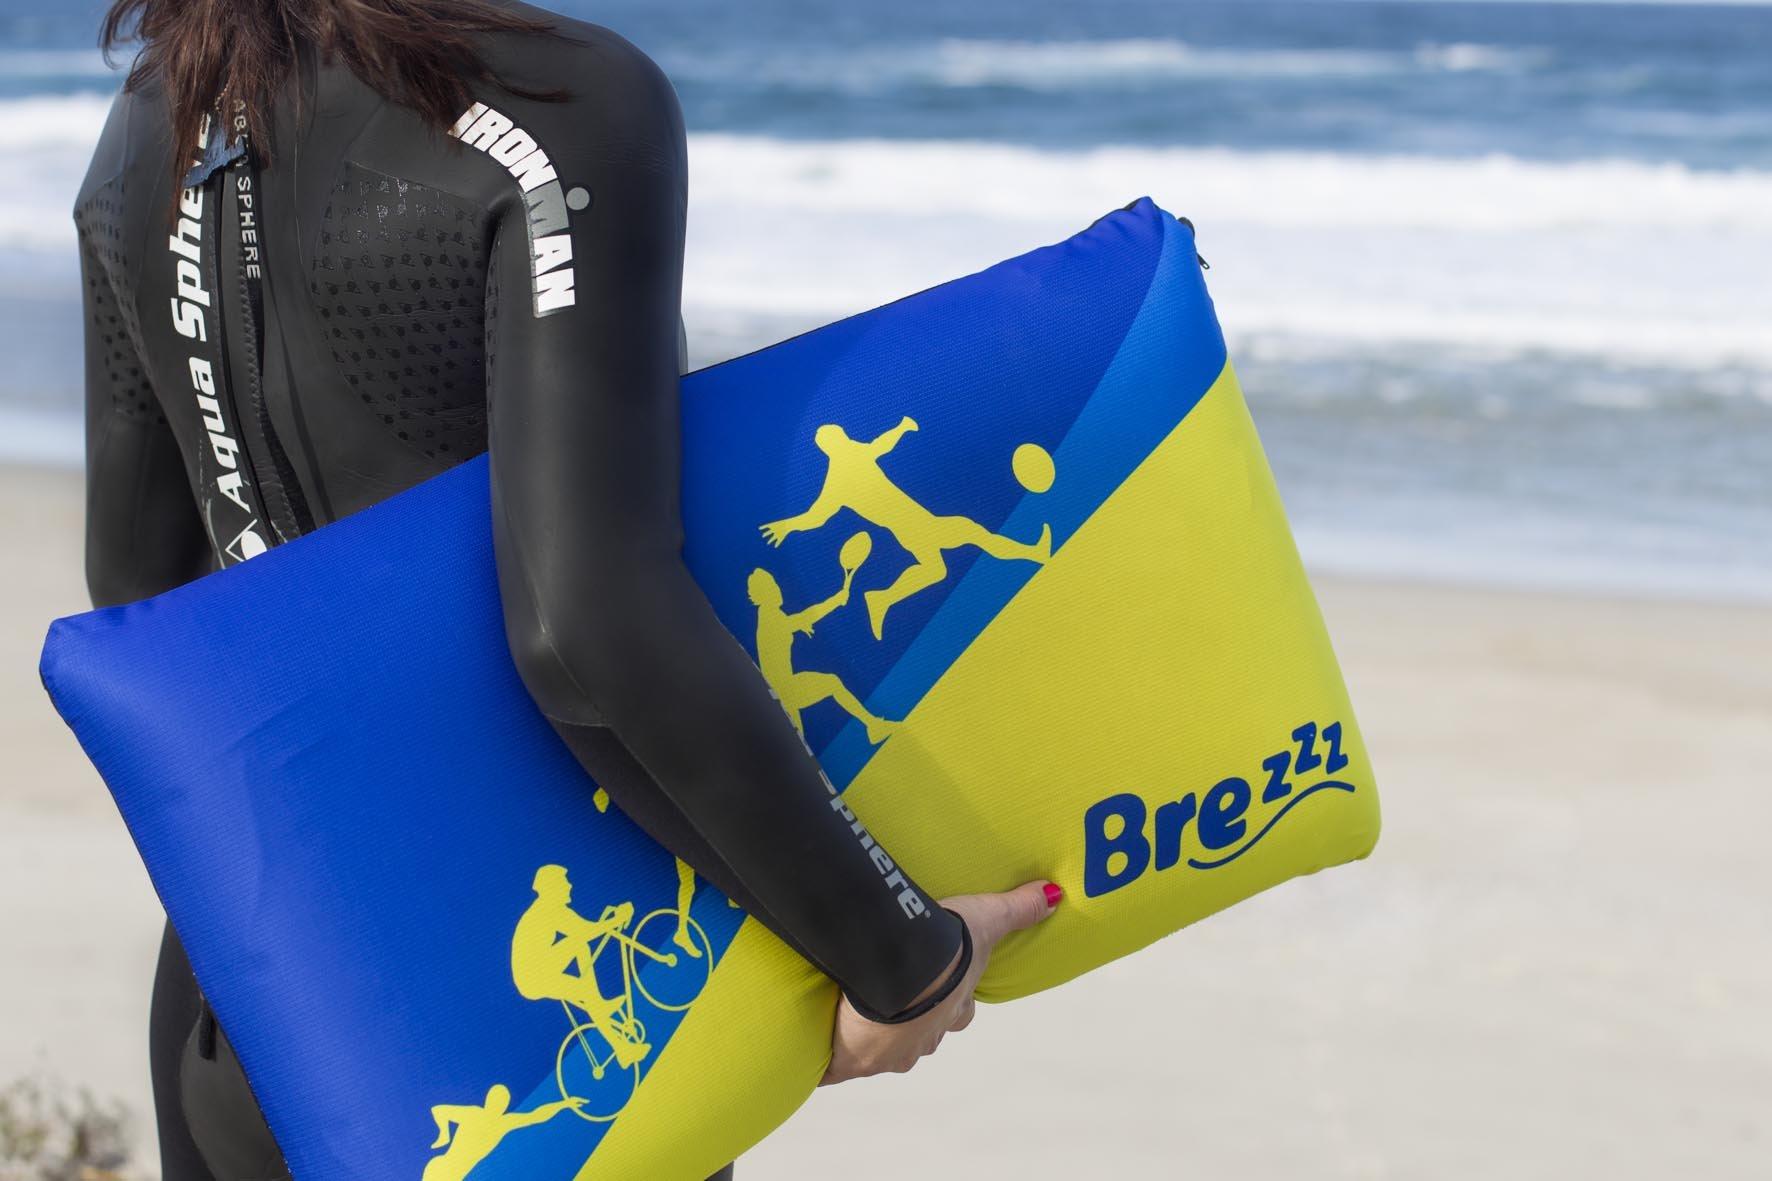 Almohada viscoleastica para deportistas Brezzz